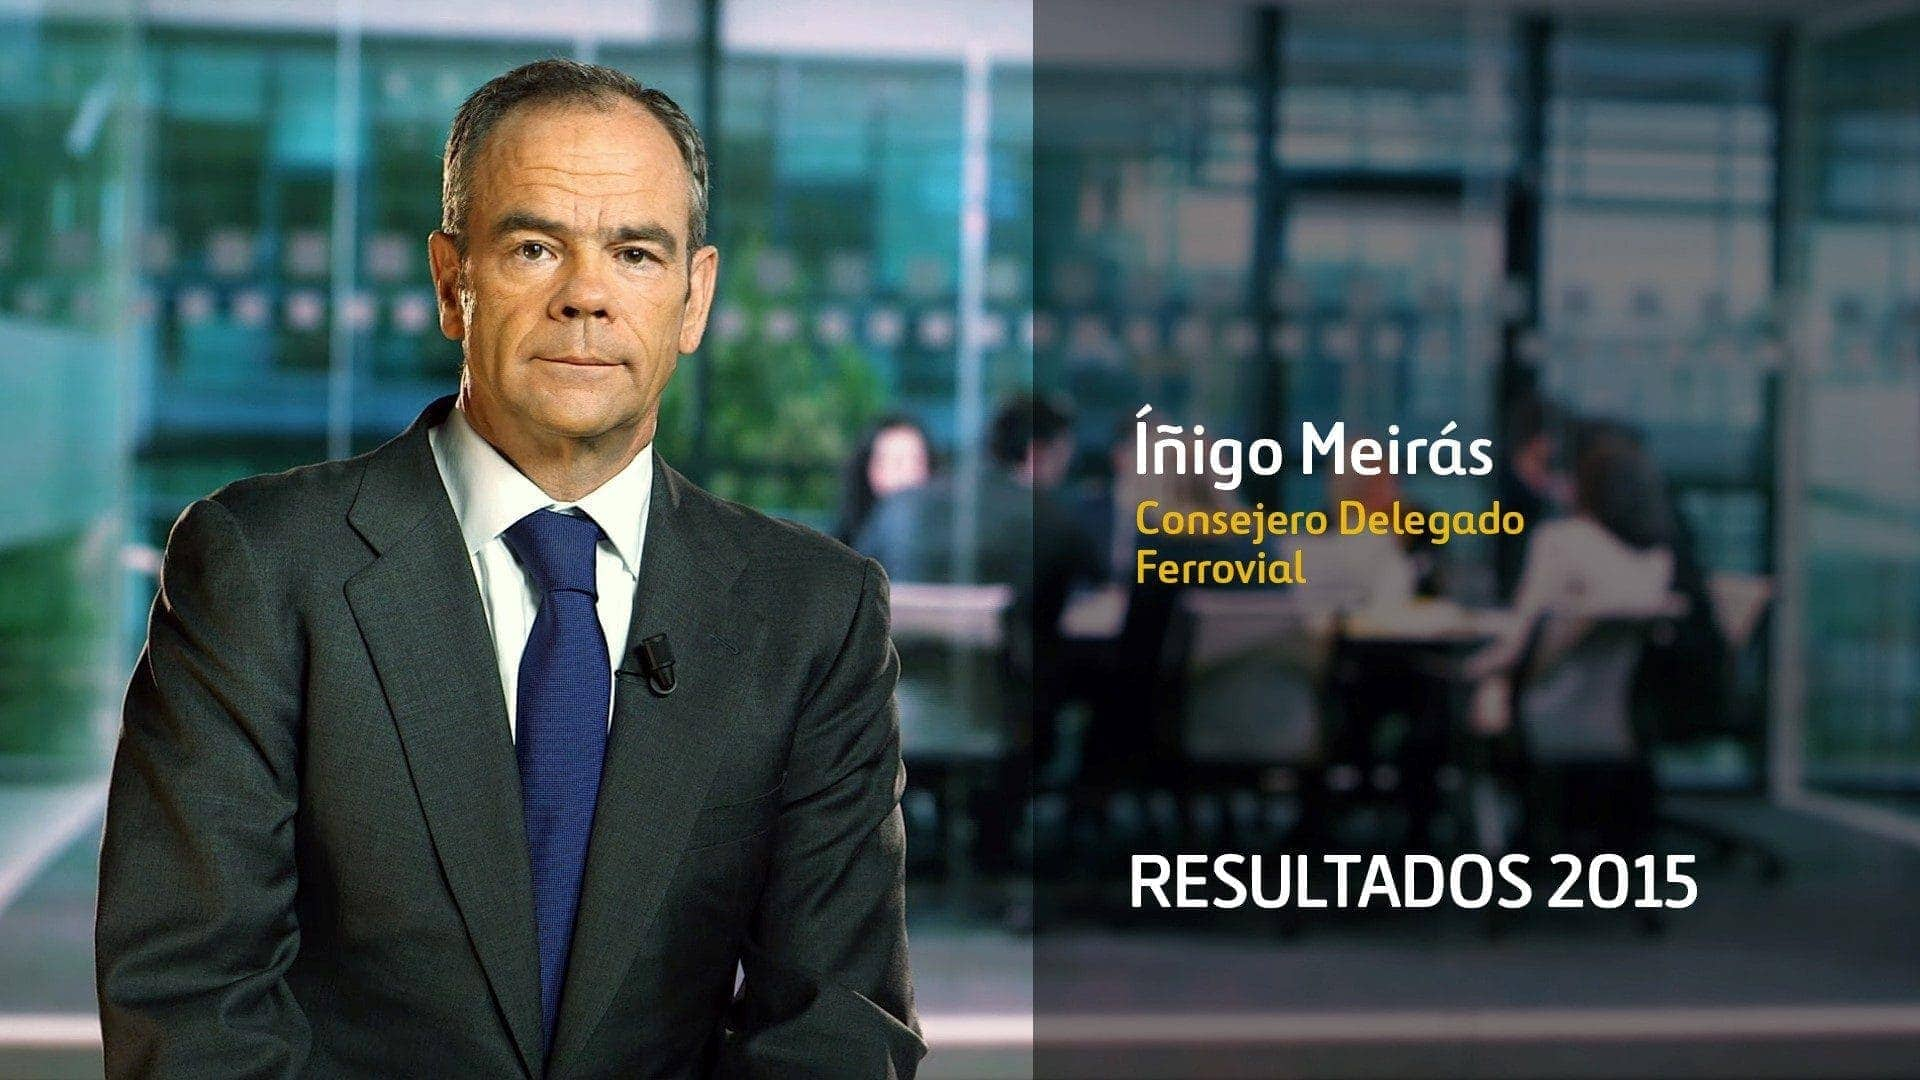 Iñigo Meirás CEo Ferrovial Resultados 2015